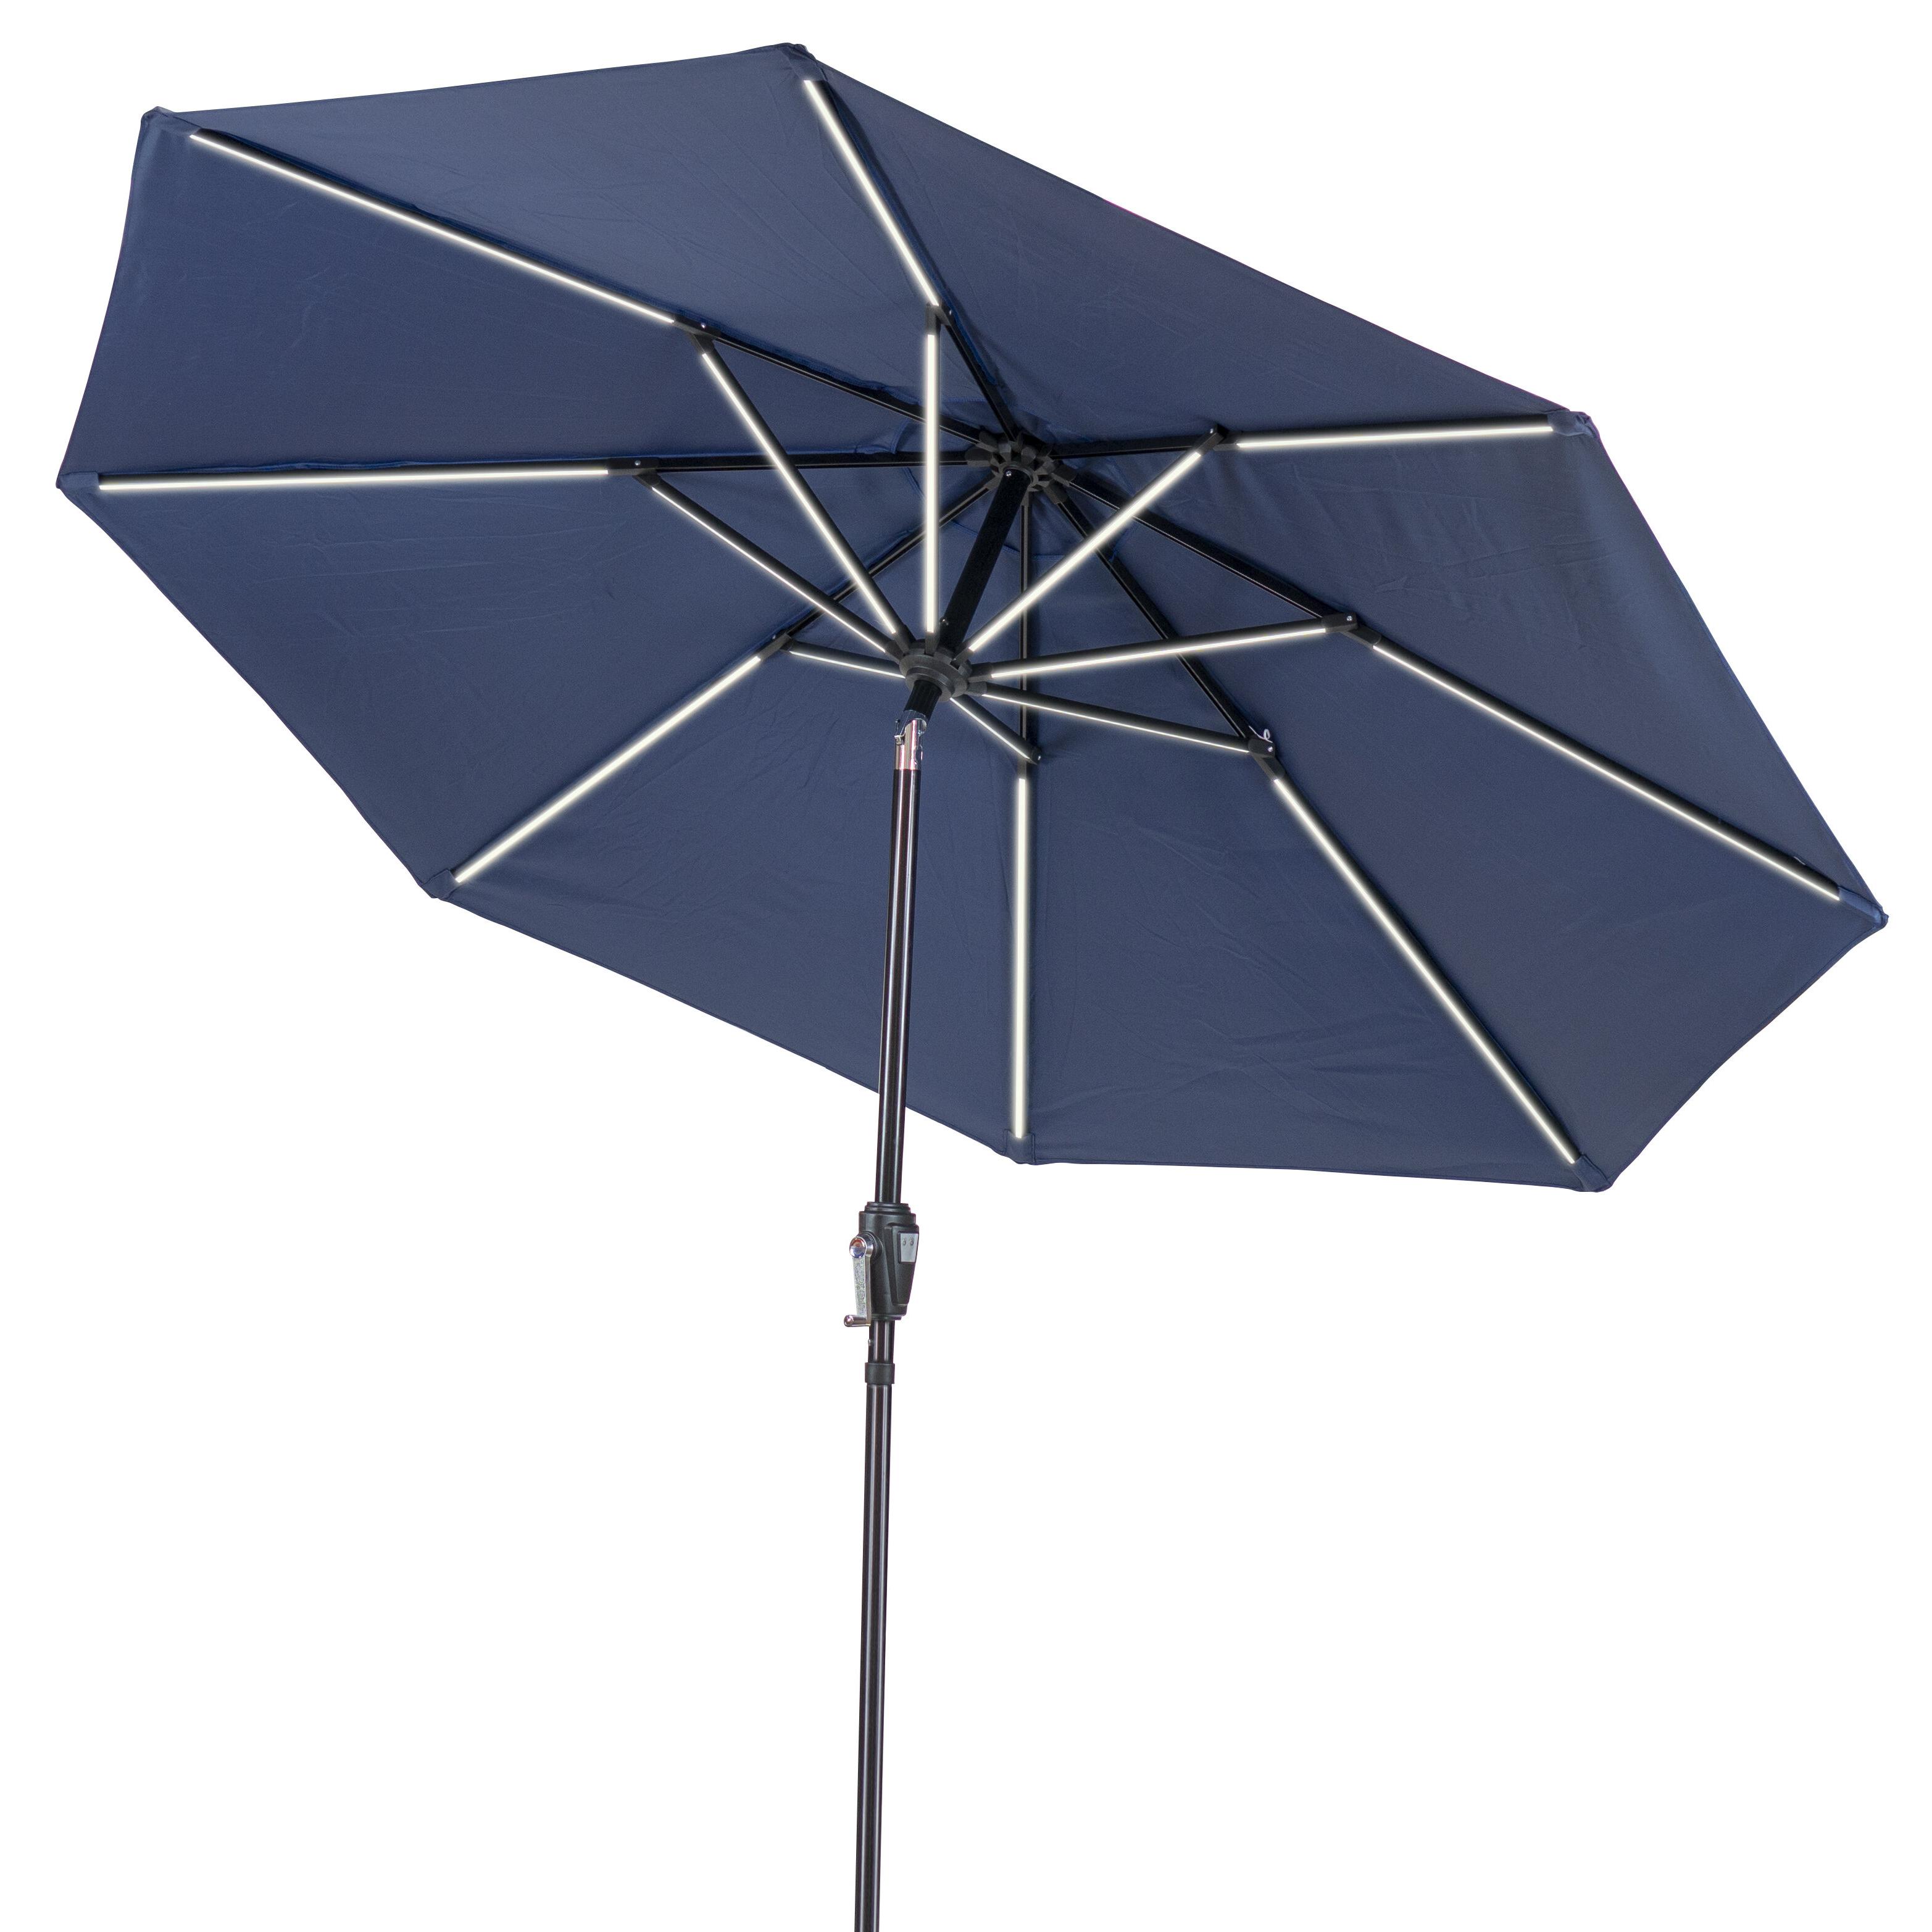 Most Recent Sun Ray Solar Cantilever Umbrellas In Sun Ray Next Gen Solar Round 9' Market Umbrella (View 10 of 20)